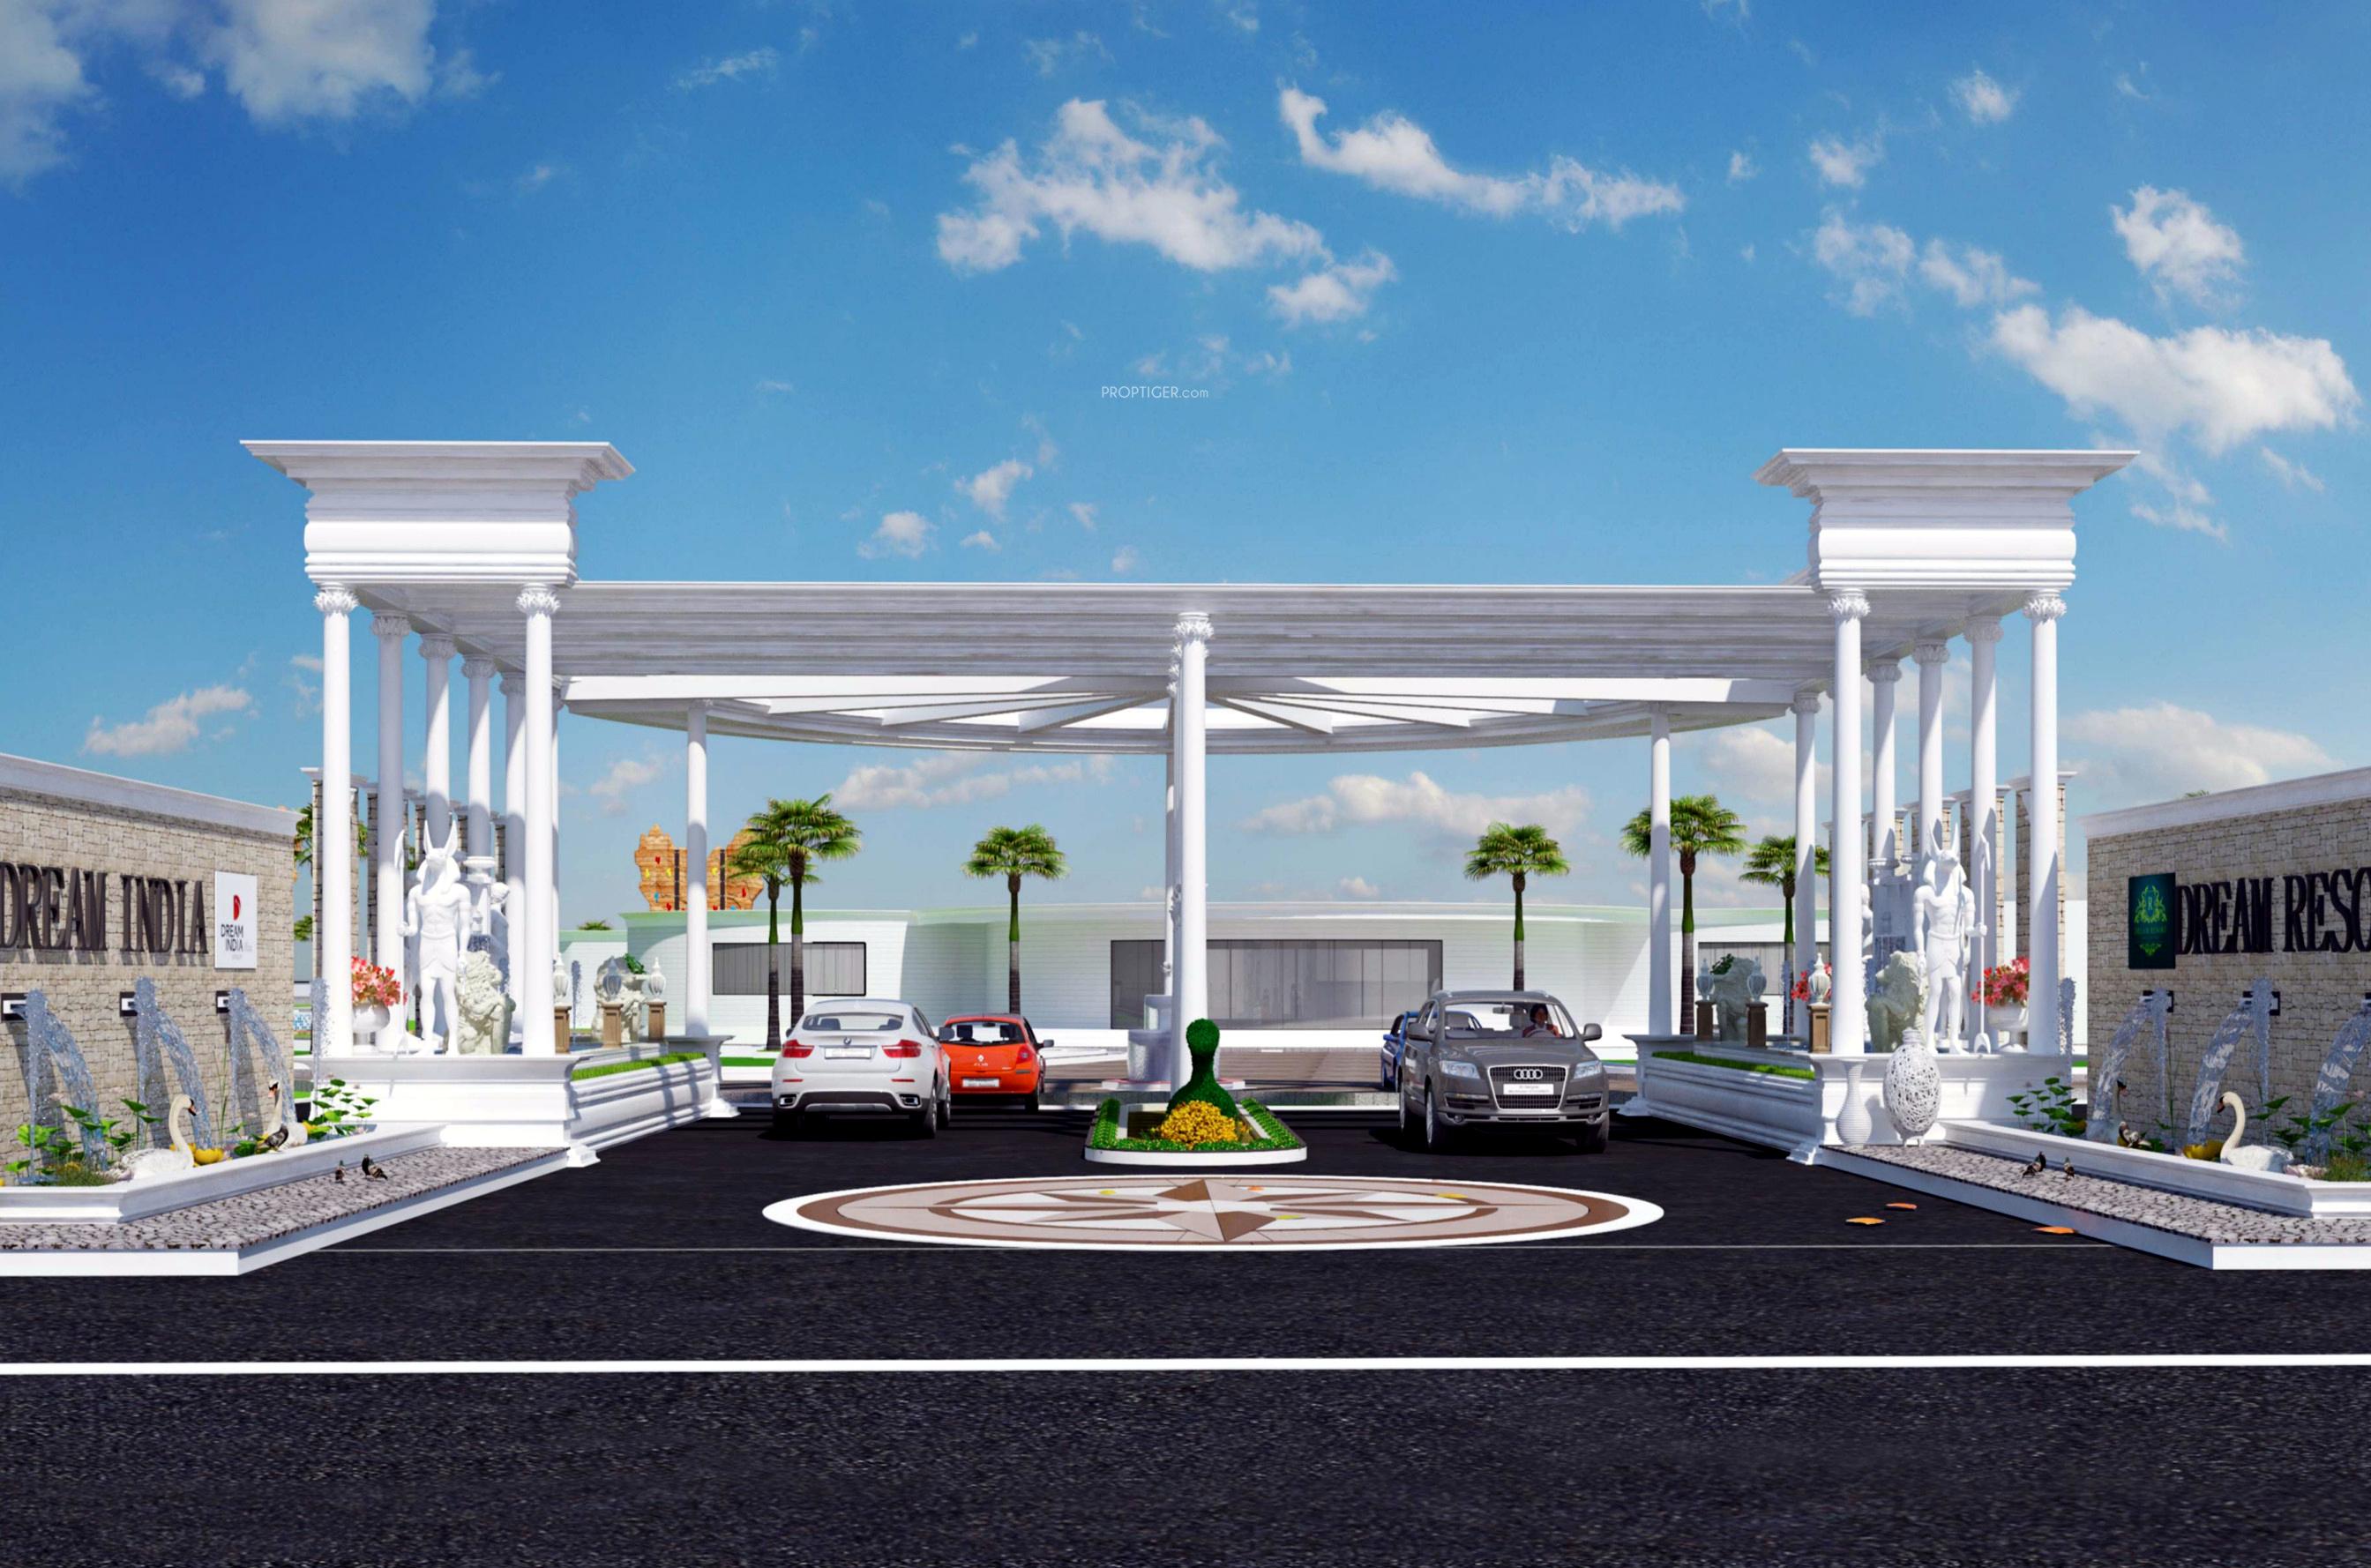 Resort Elevation Plan : Site plan image of dream india resort shamshabad hyderabad